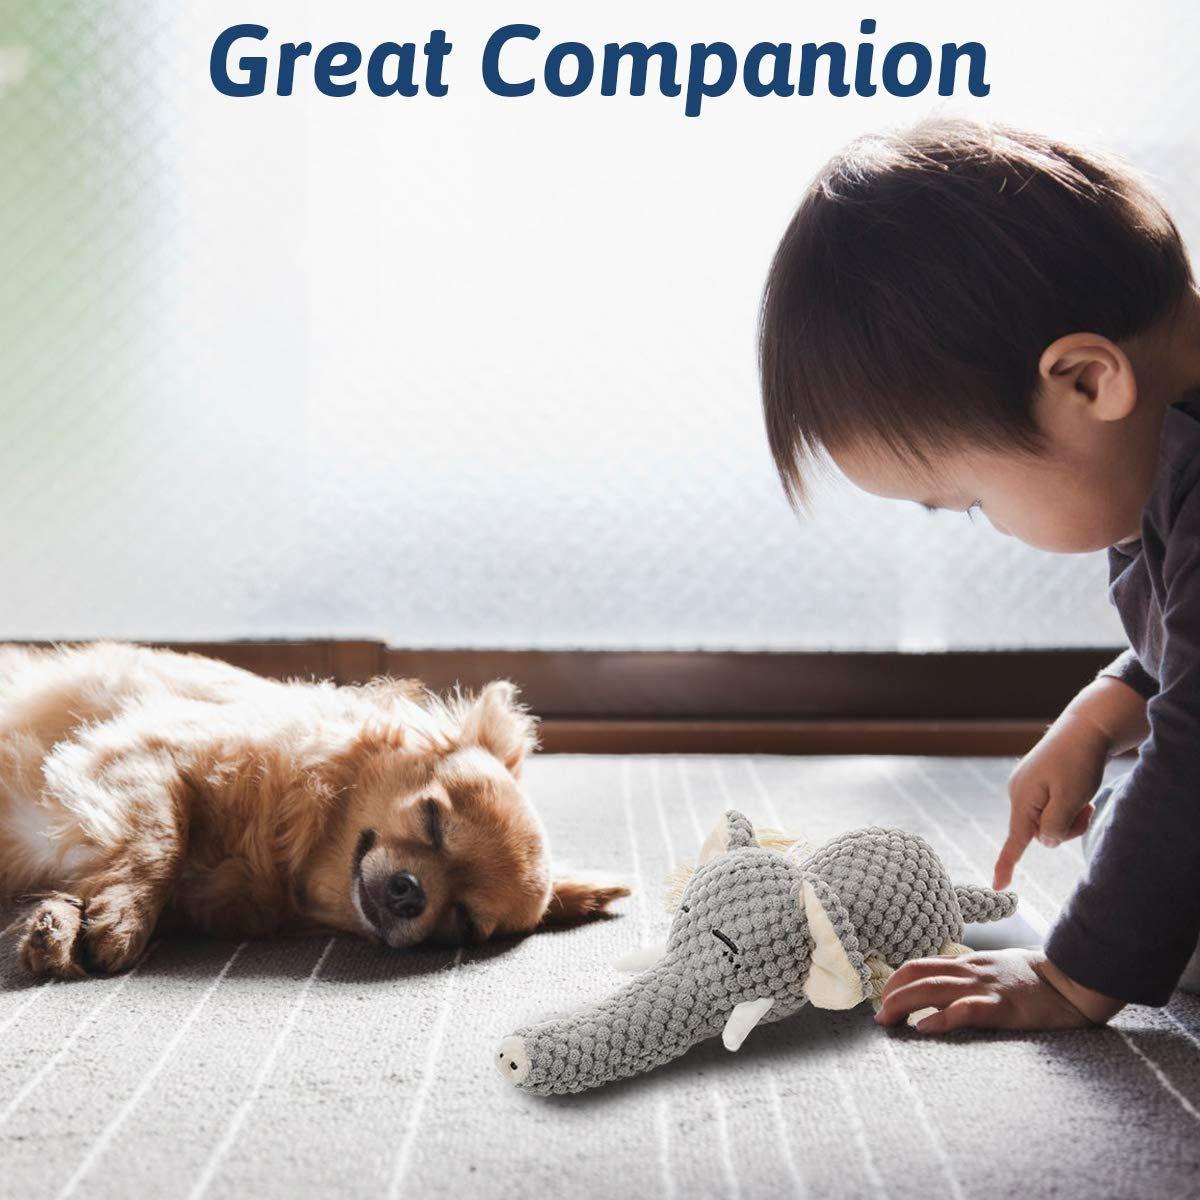 Kol Dog Plush Toys Dog Chew Toys Pet Squeaky Toys With Crinkle